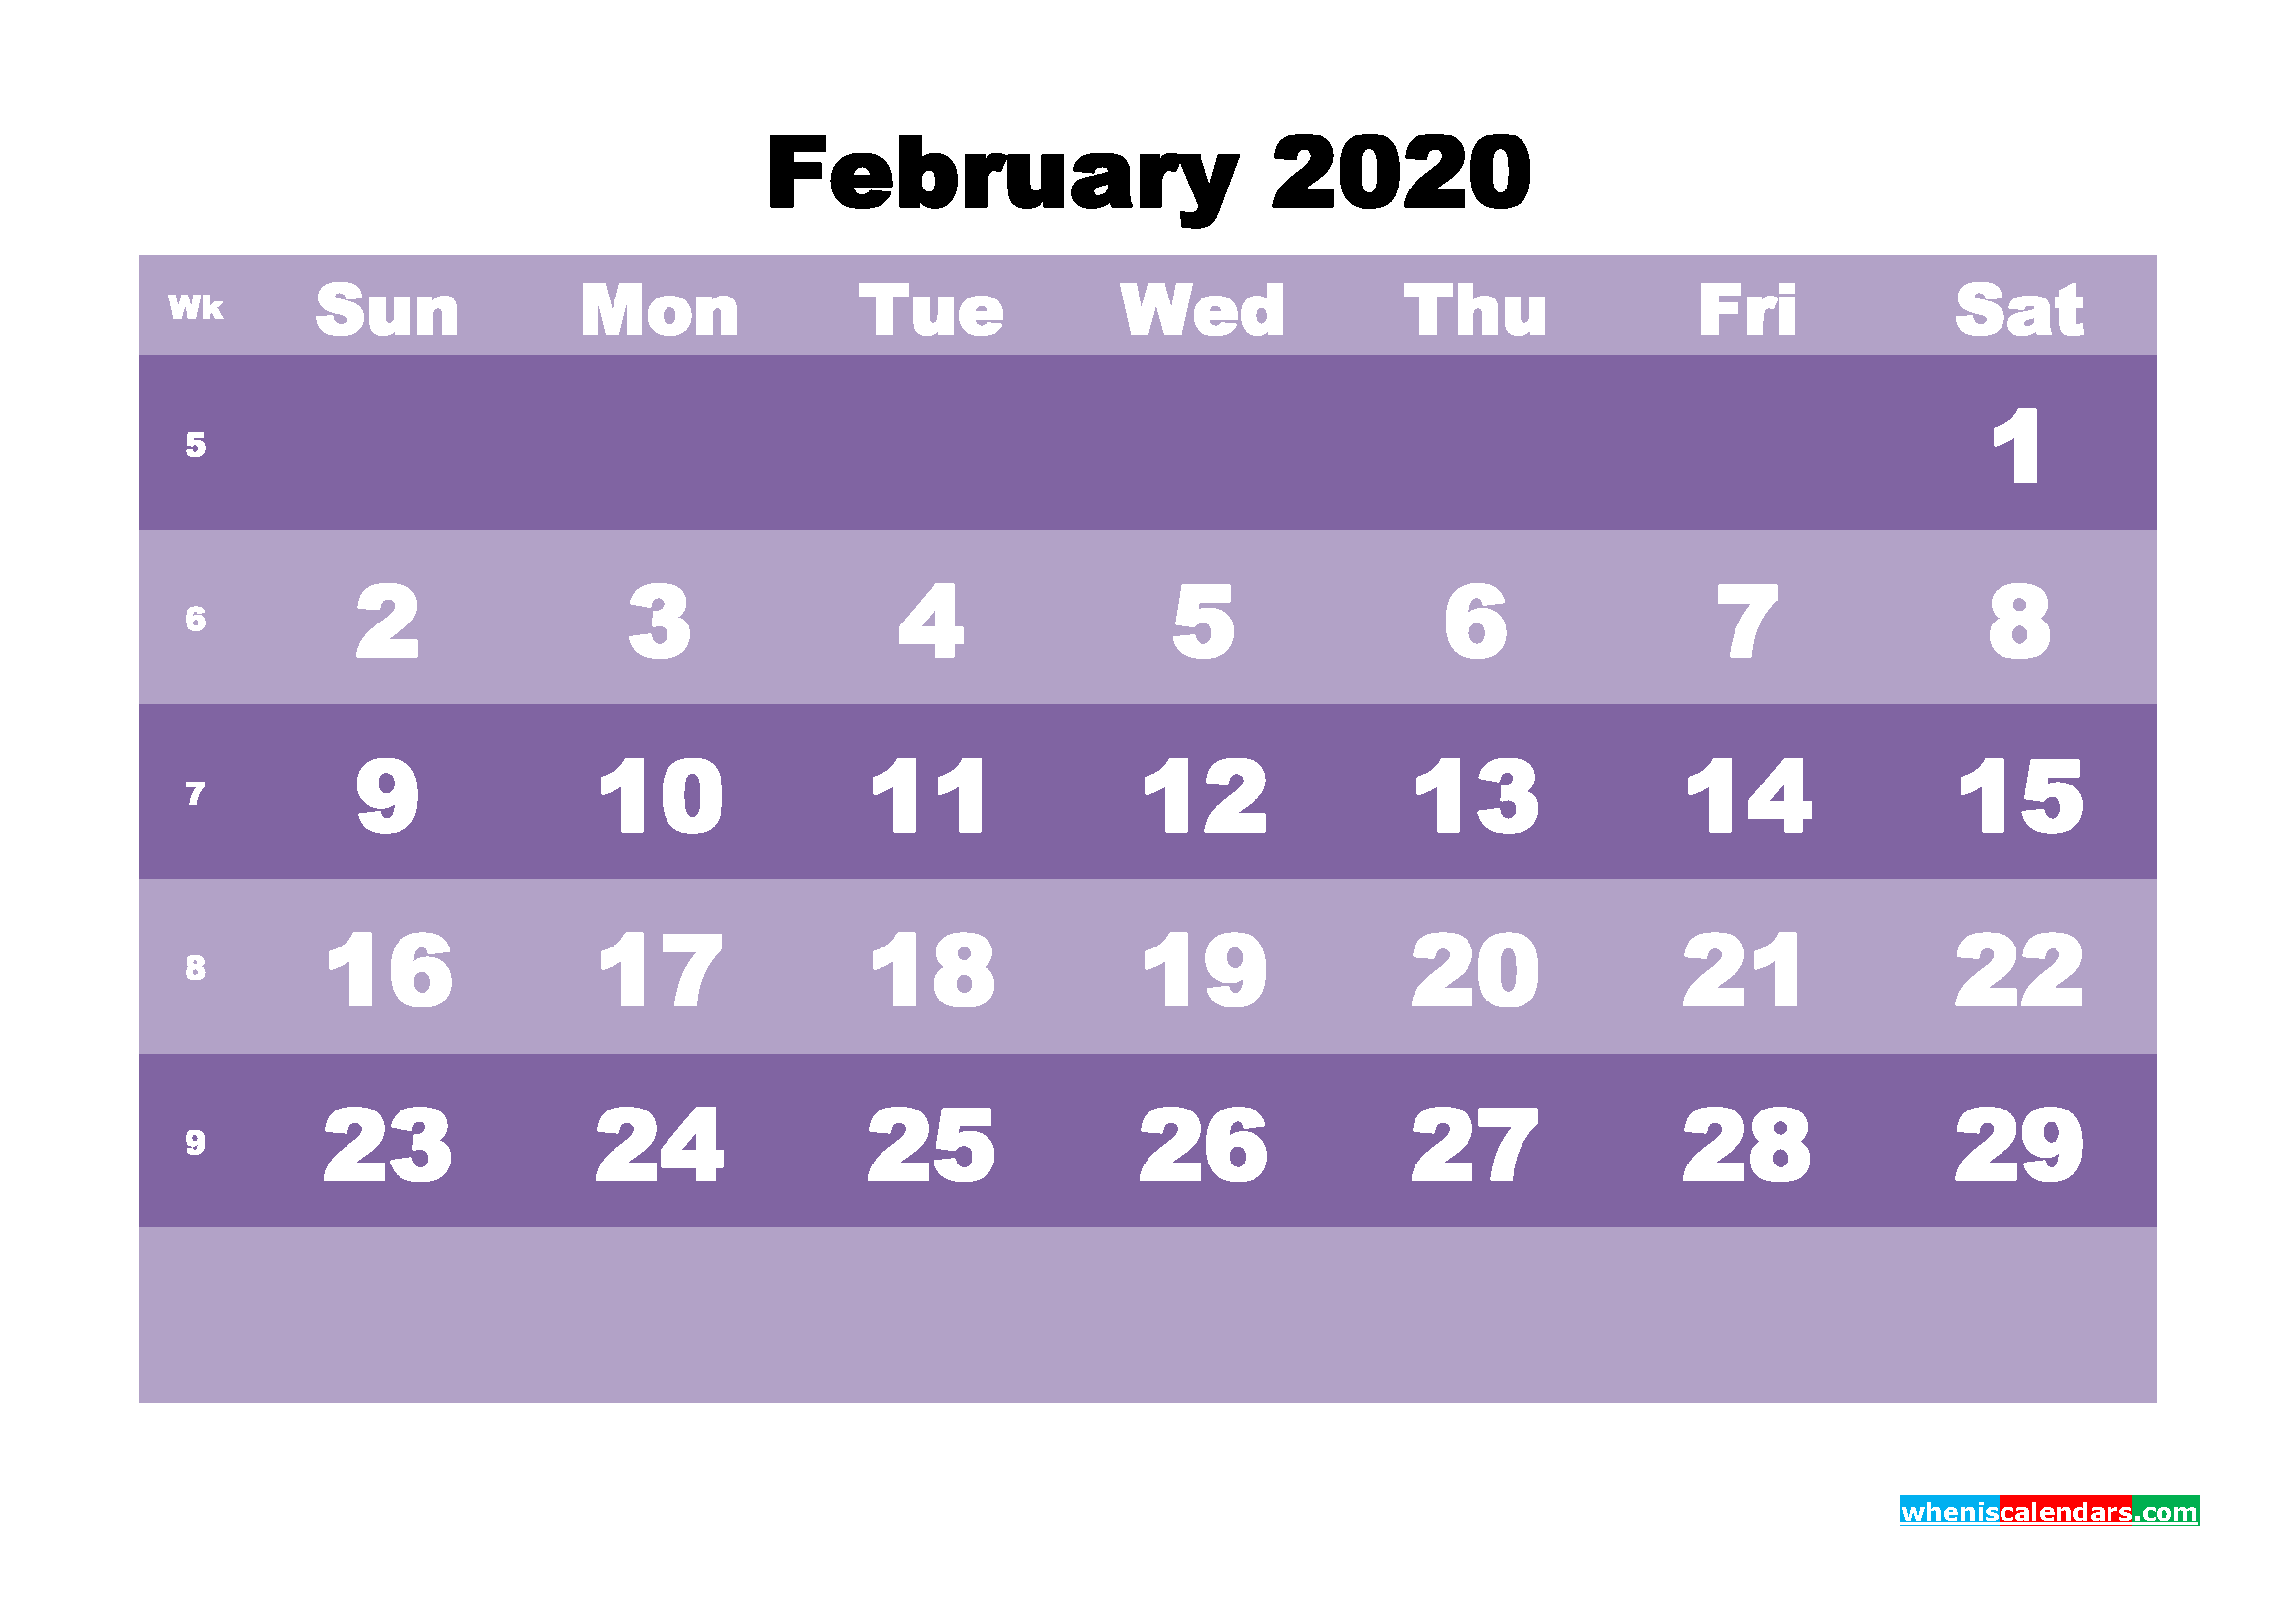 Blank February 2020 Calendar Printable - No.m20b554